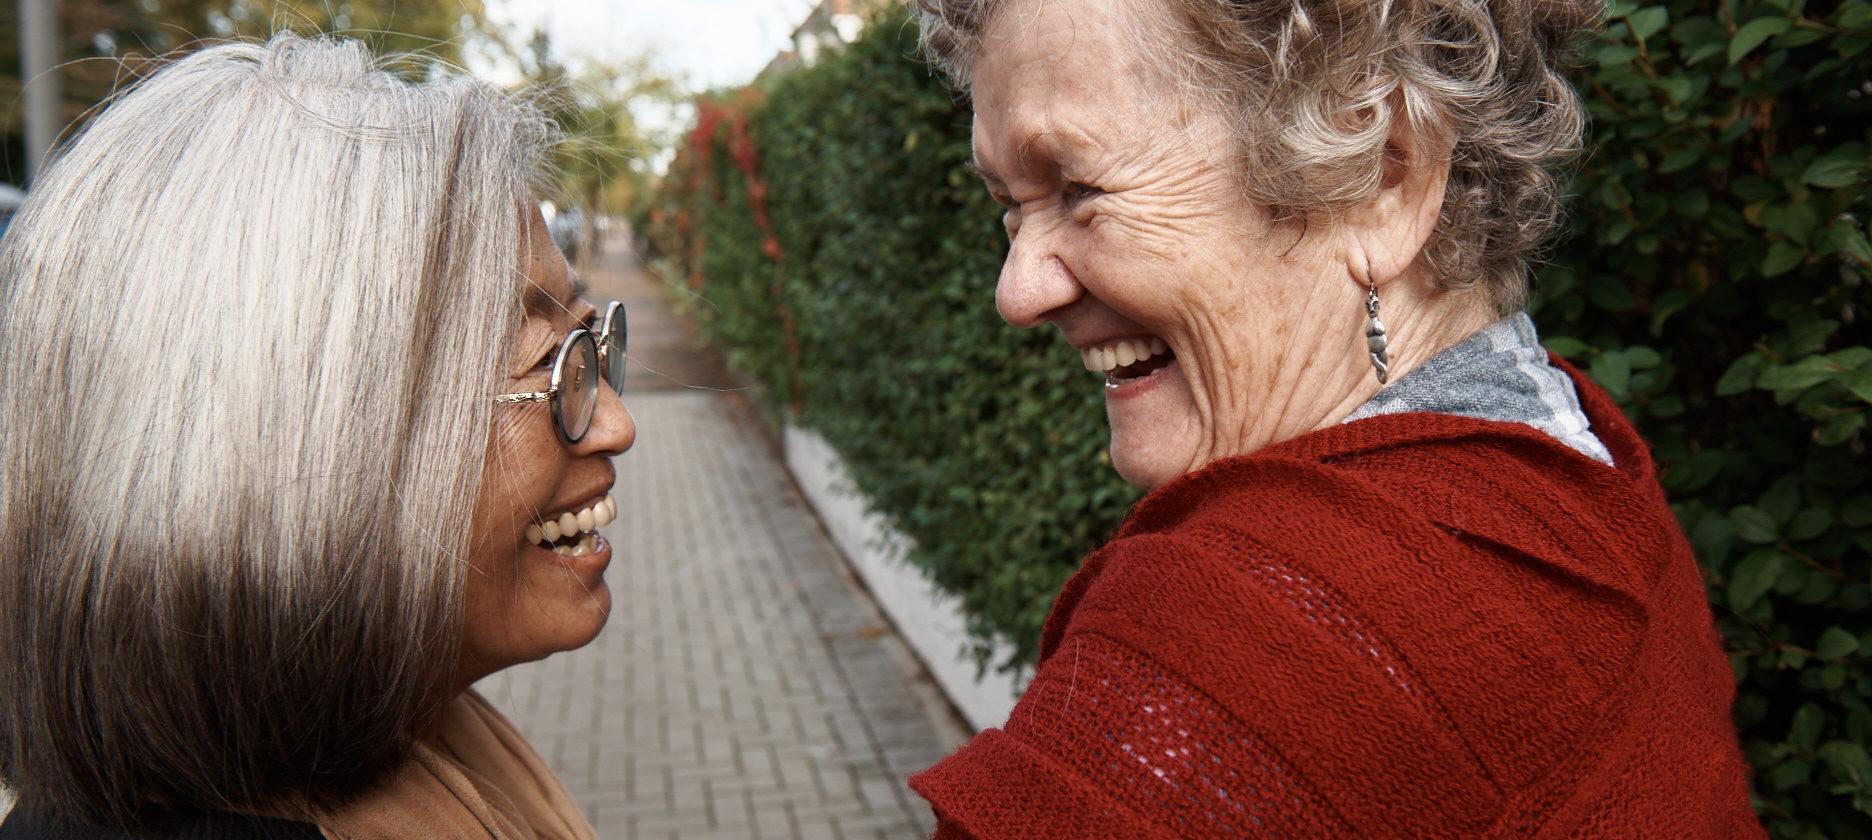 guild living two older friends walking outside smiling